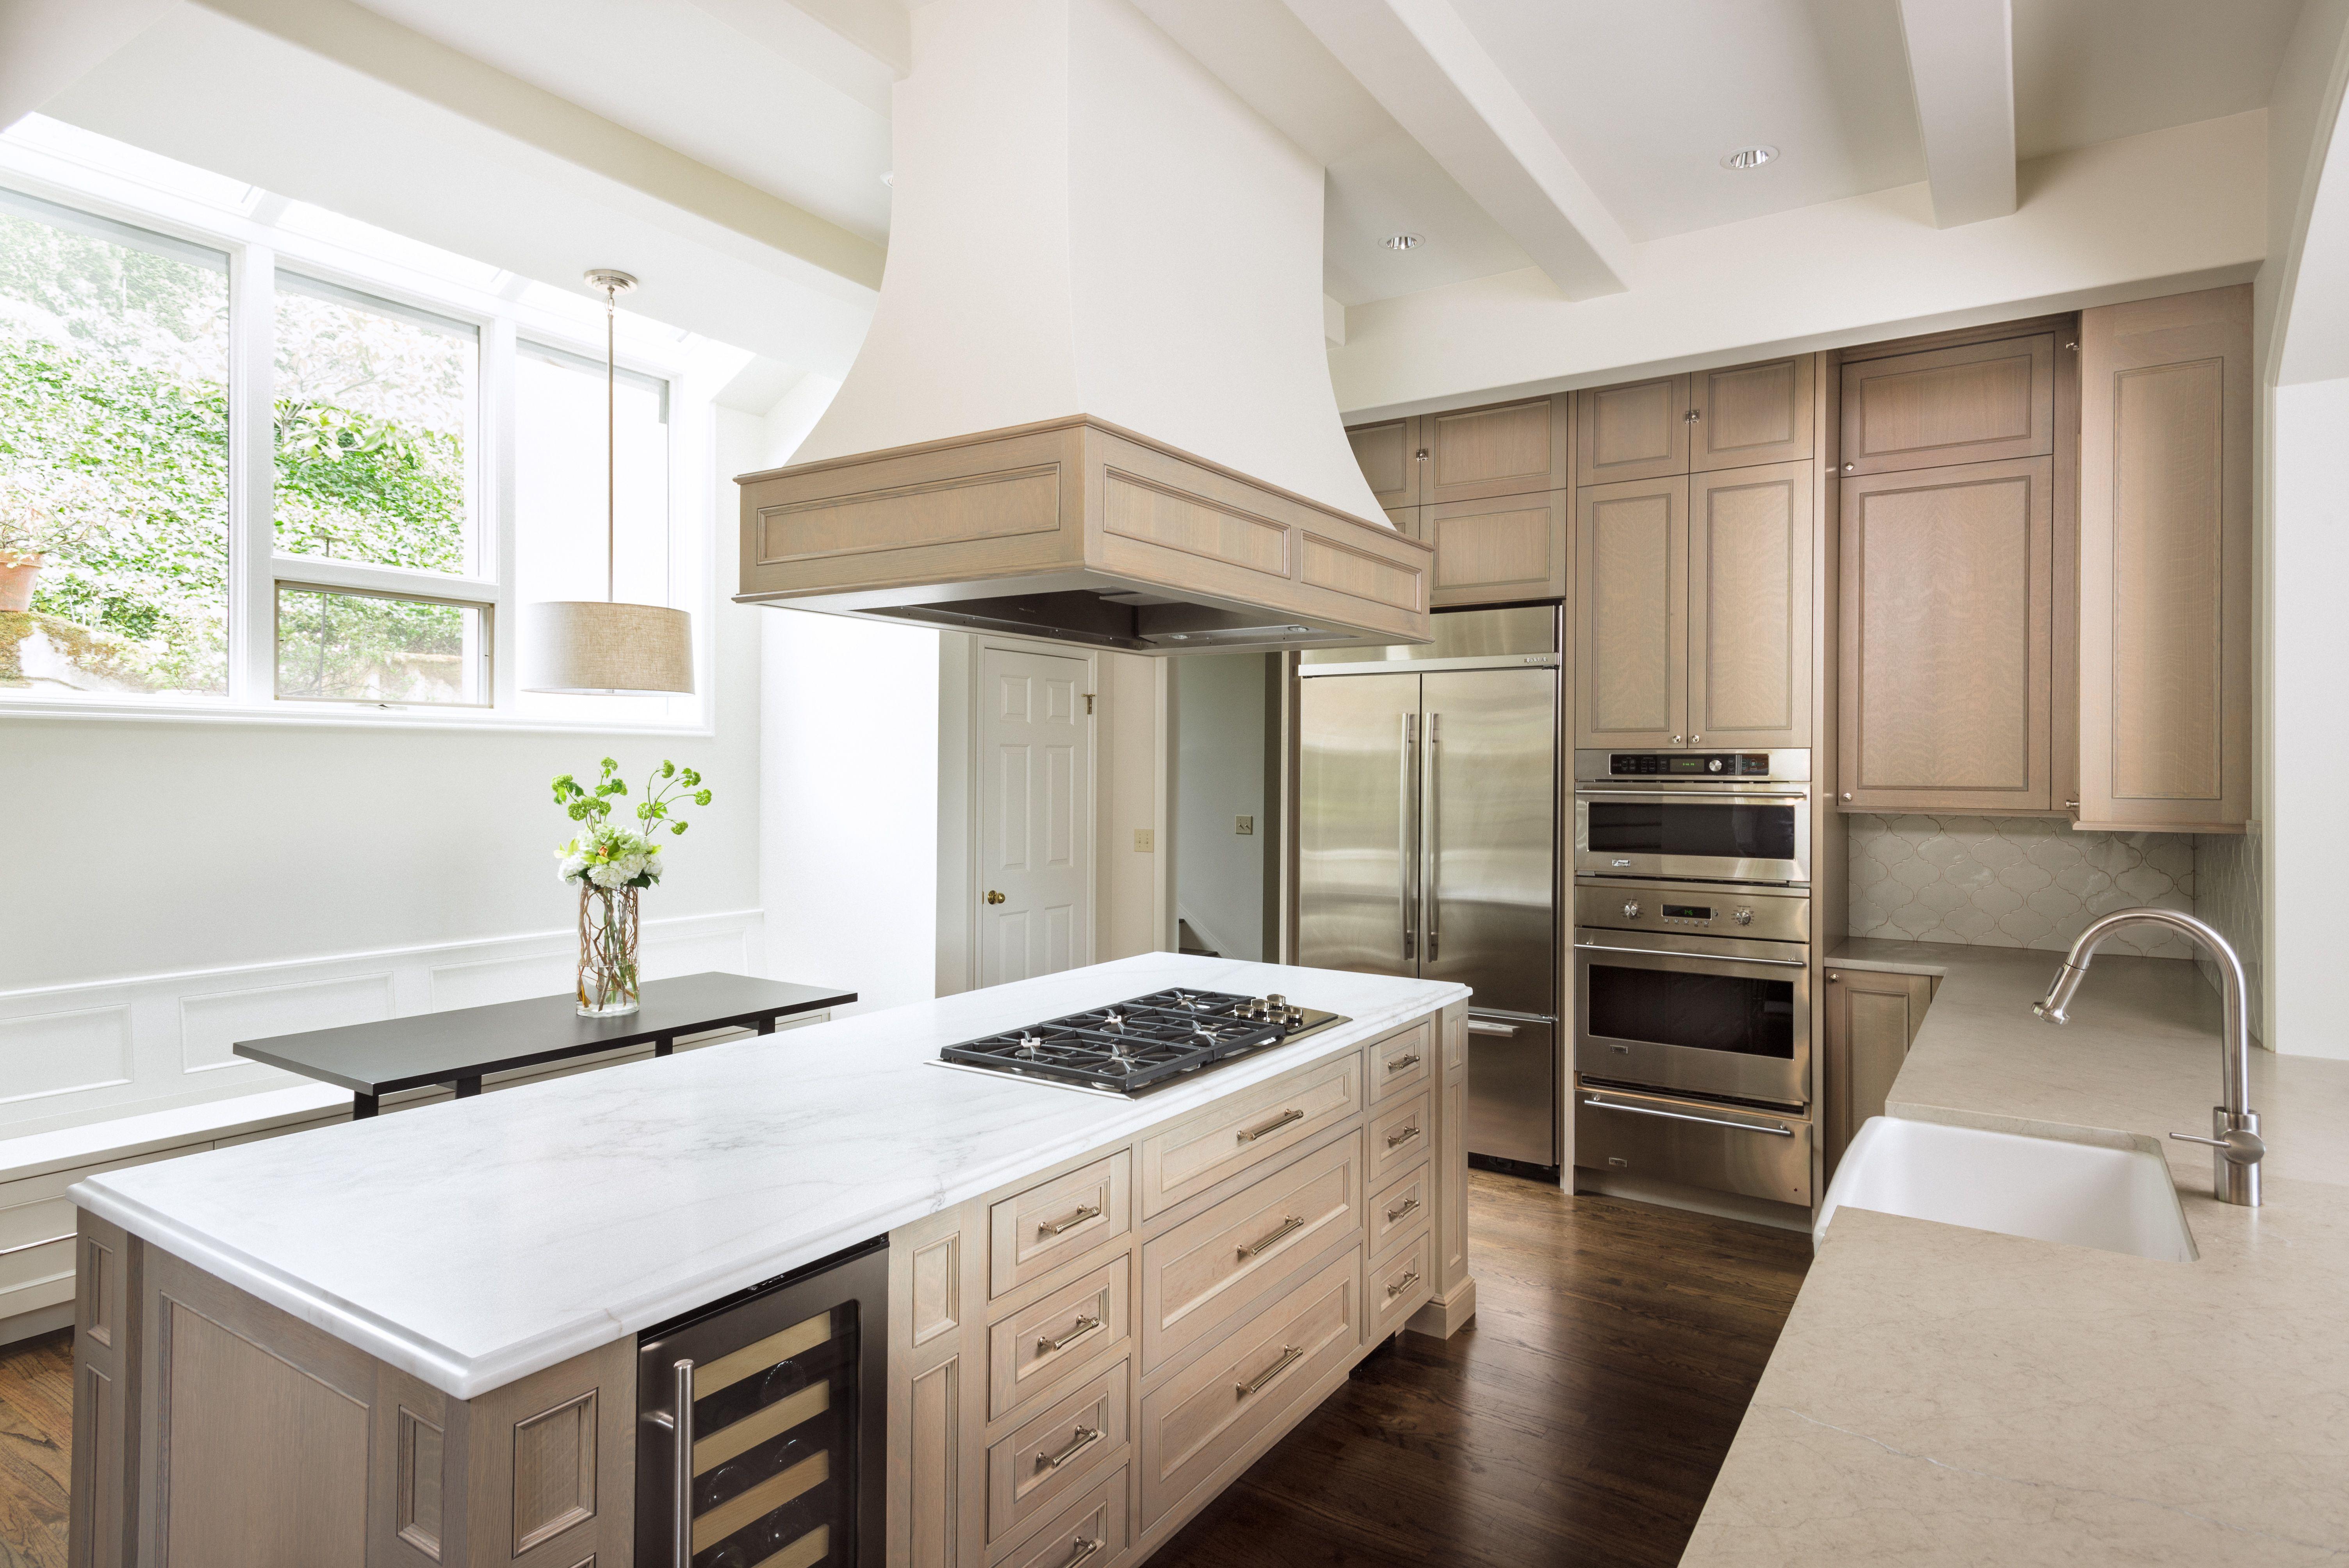 Pin By Ripple Design Studio On Kirkland Home Remodel Home Remodeling Kitchen Remodel Remodel